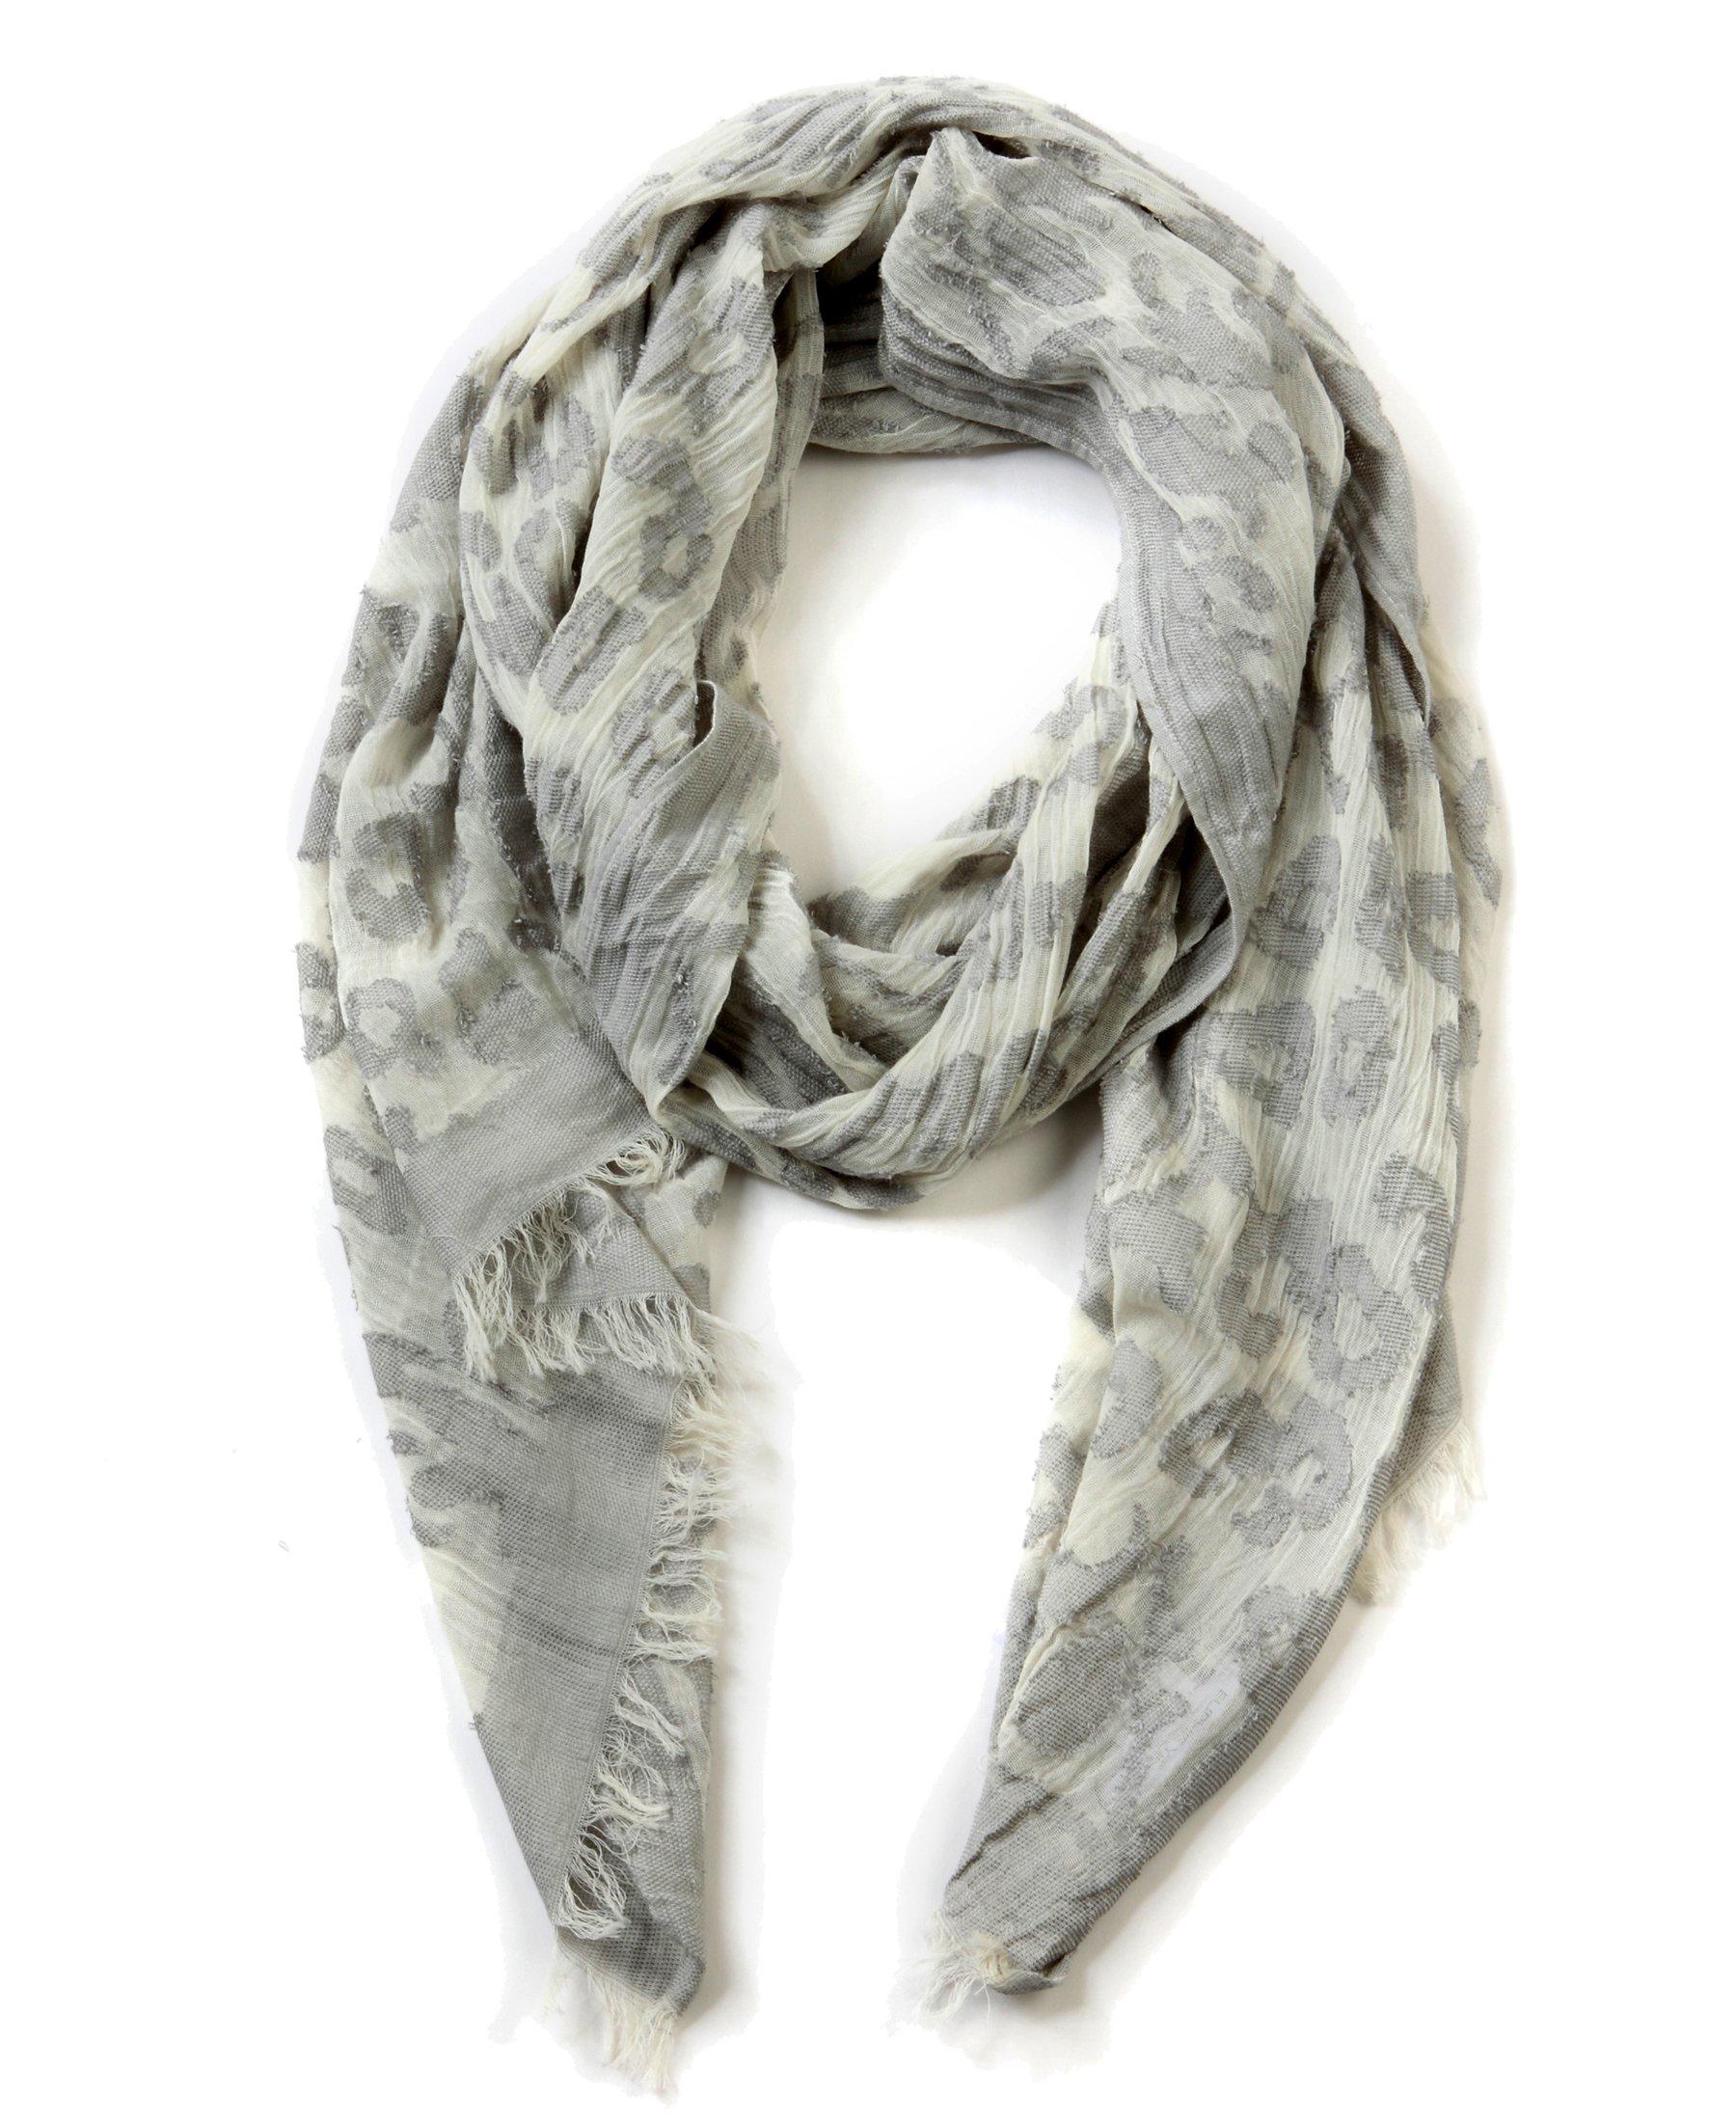 EUPHIE YING Women's Classy Cotton Scarves Fashion Shawl Wrap, Jacquard